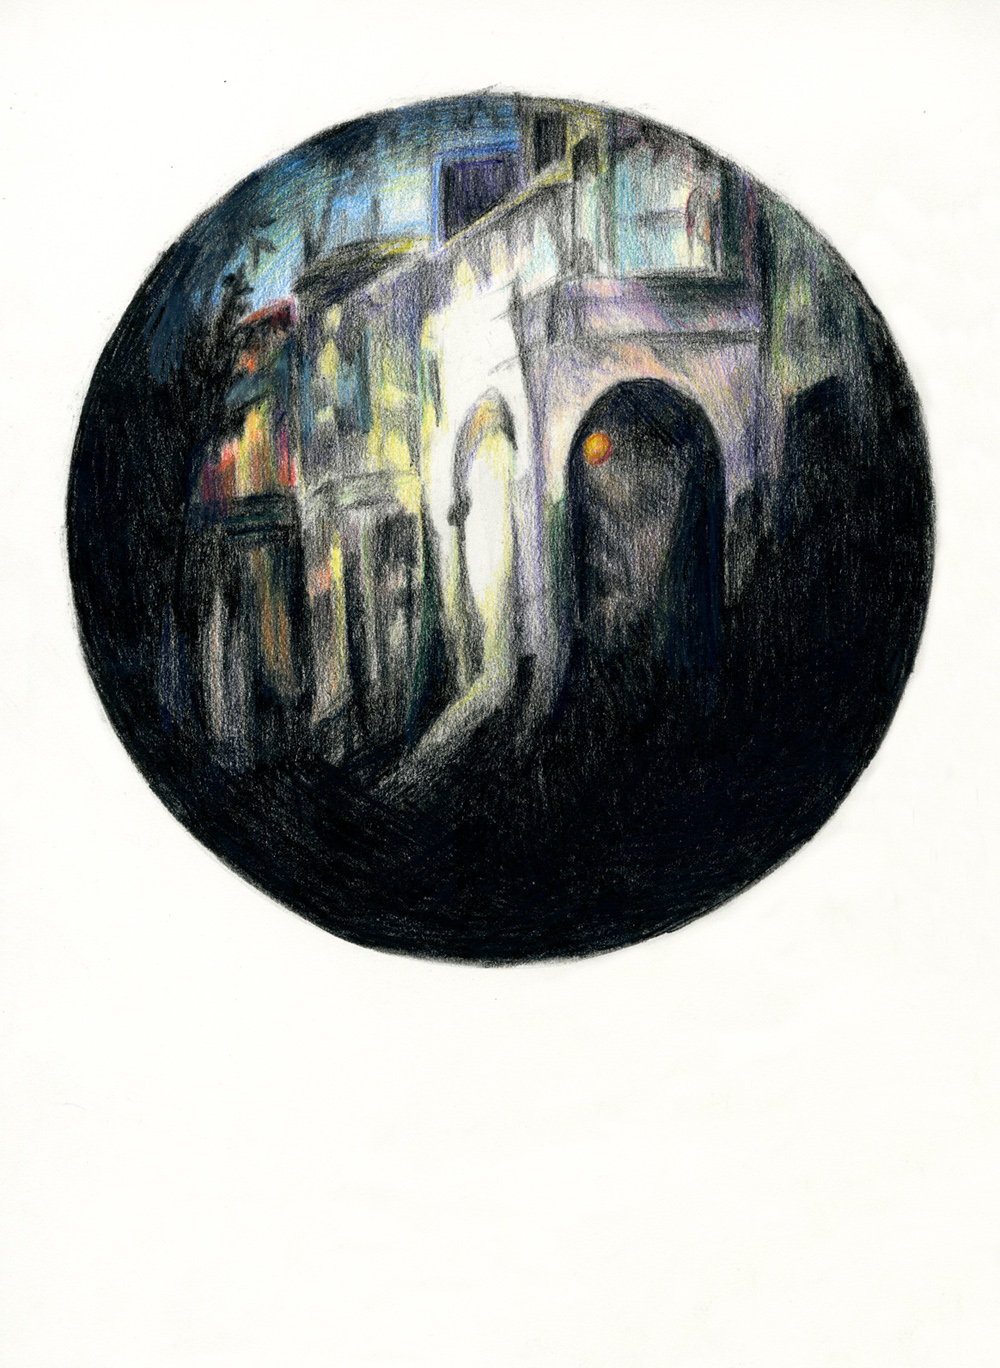 Intersections: Light Studies, 2010